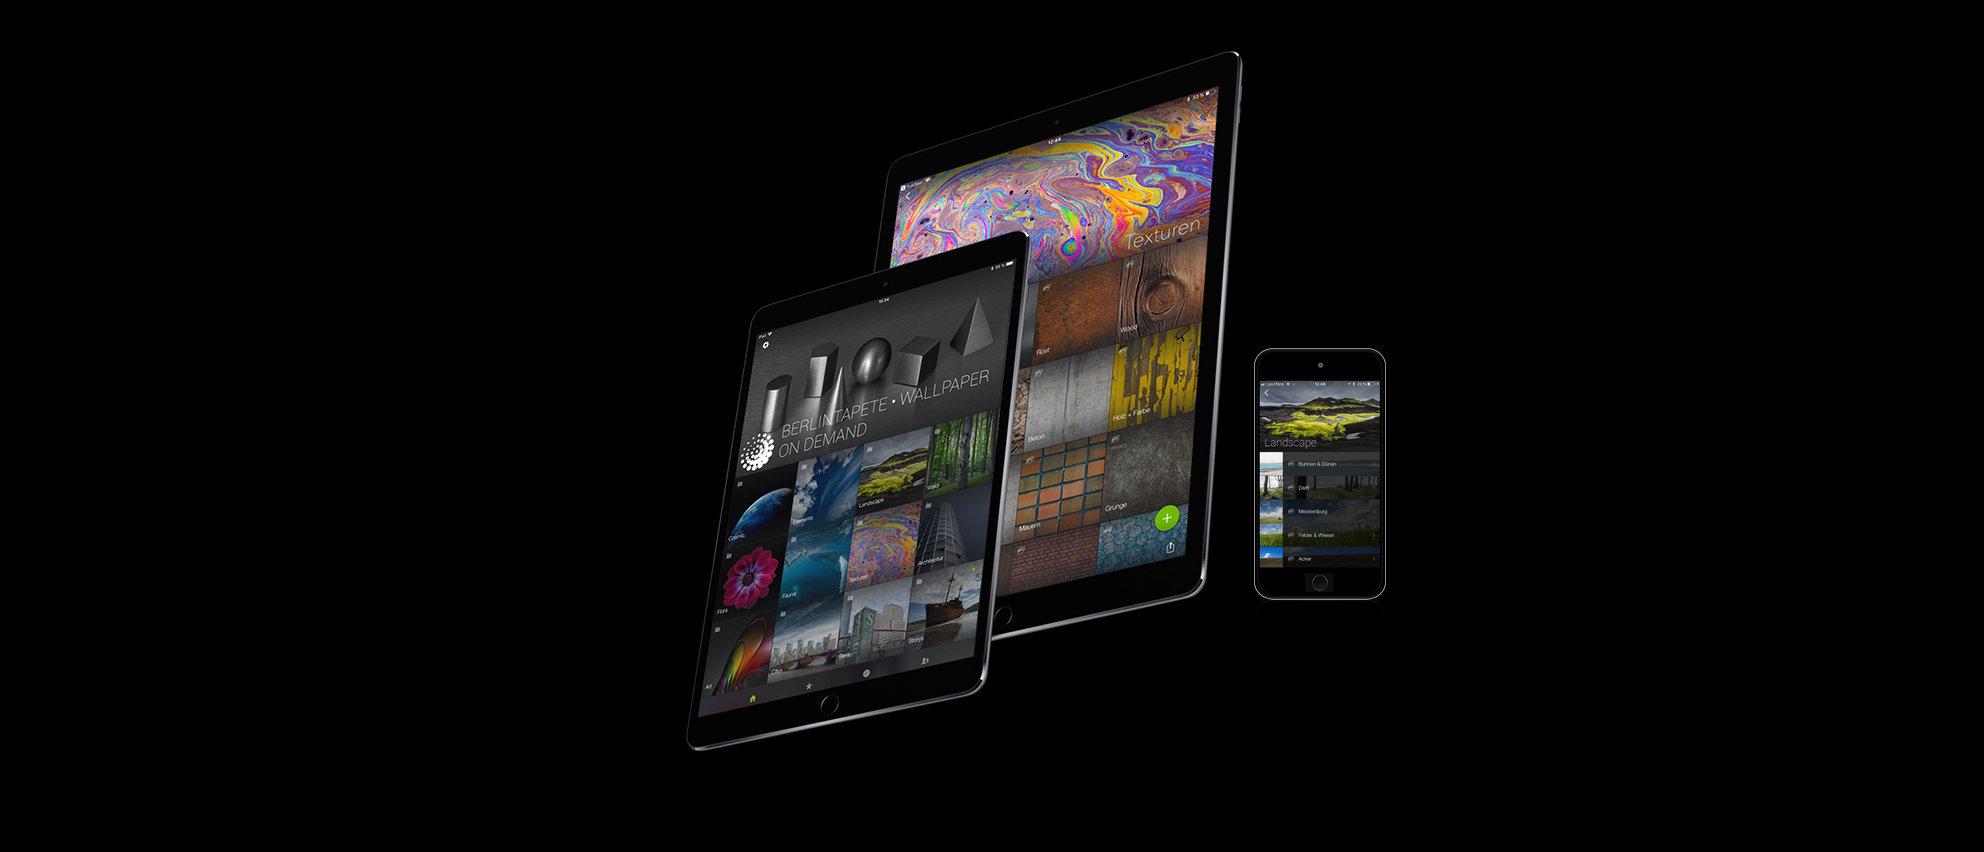 ipad iphone apple collage app berlintapete smugmug